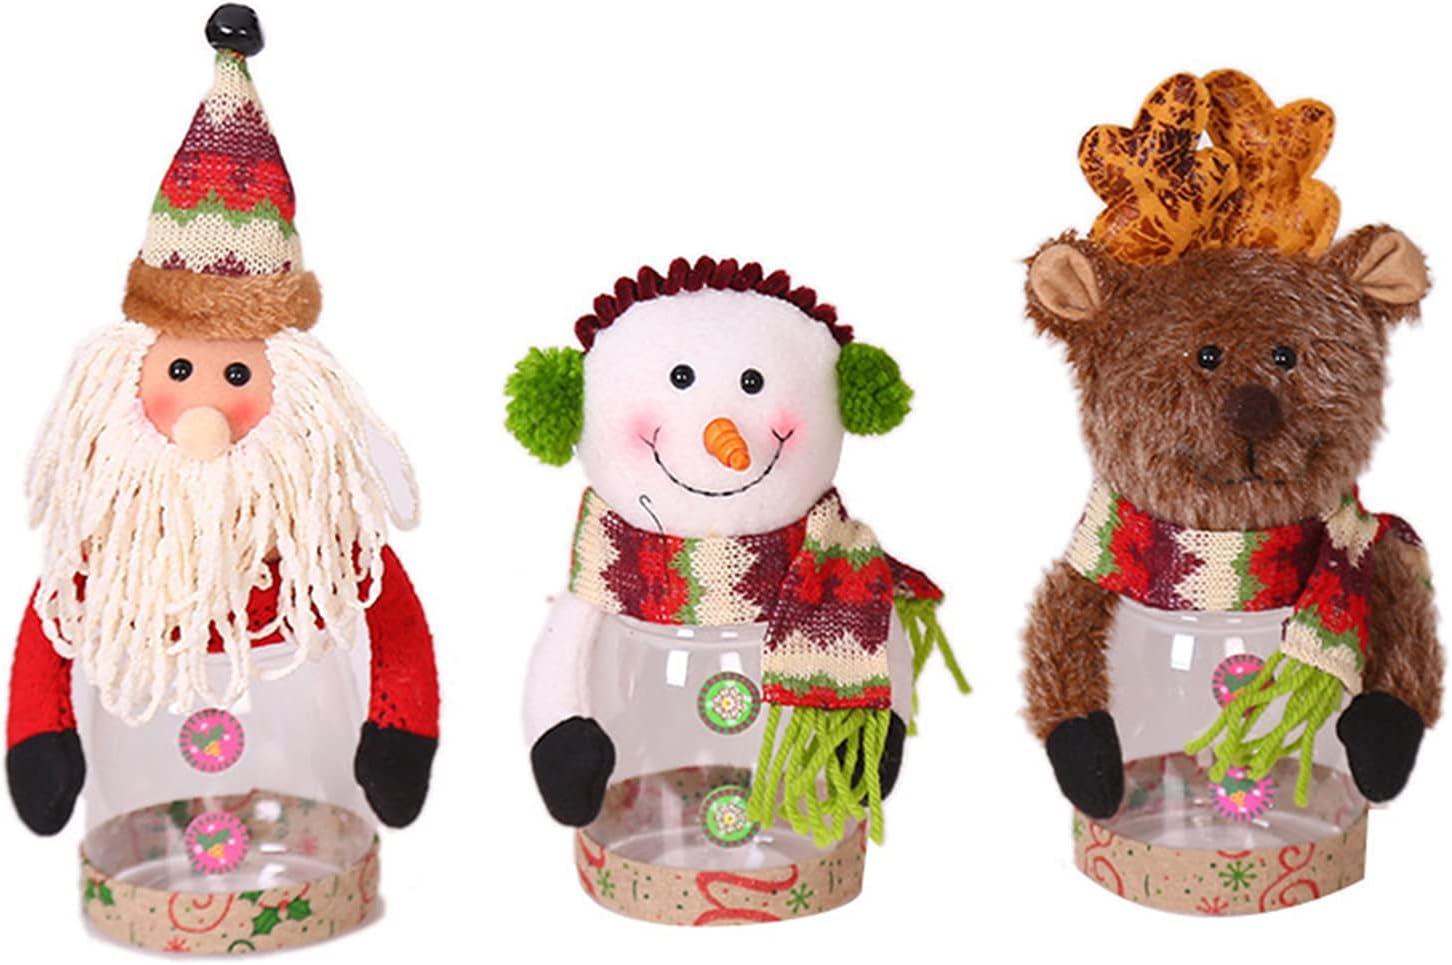 BTPOUY Safety and trust 3Pcs Christmas Candy Jar Storage Santa C Xmas Cute Bottle Seasonal Wrap Introduction